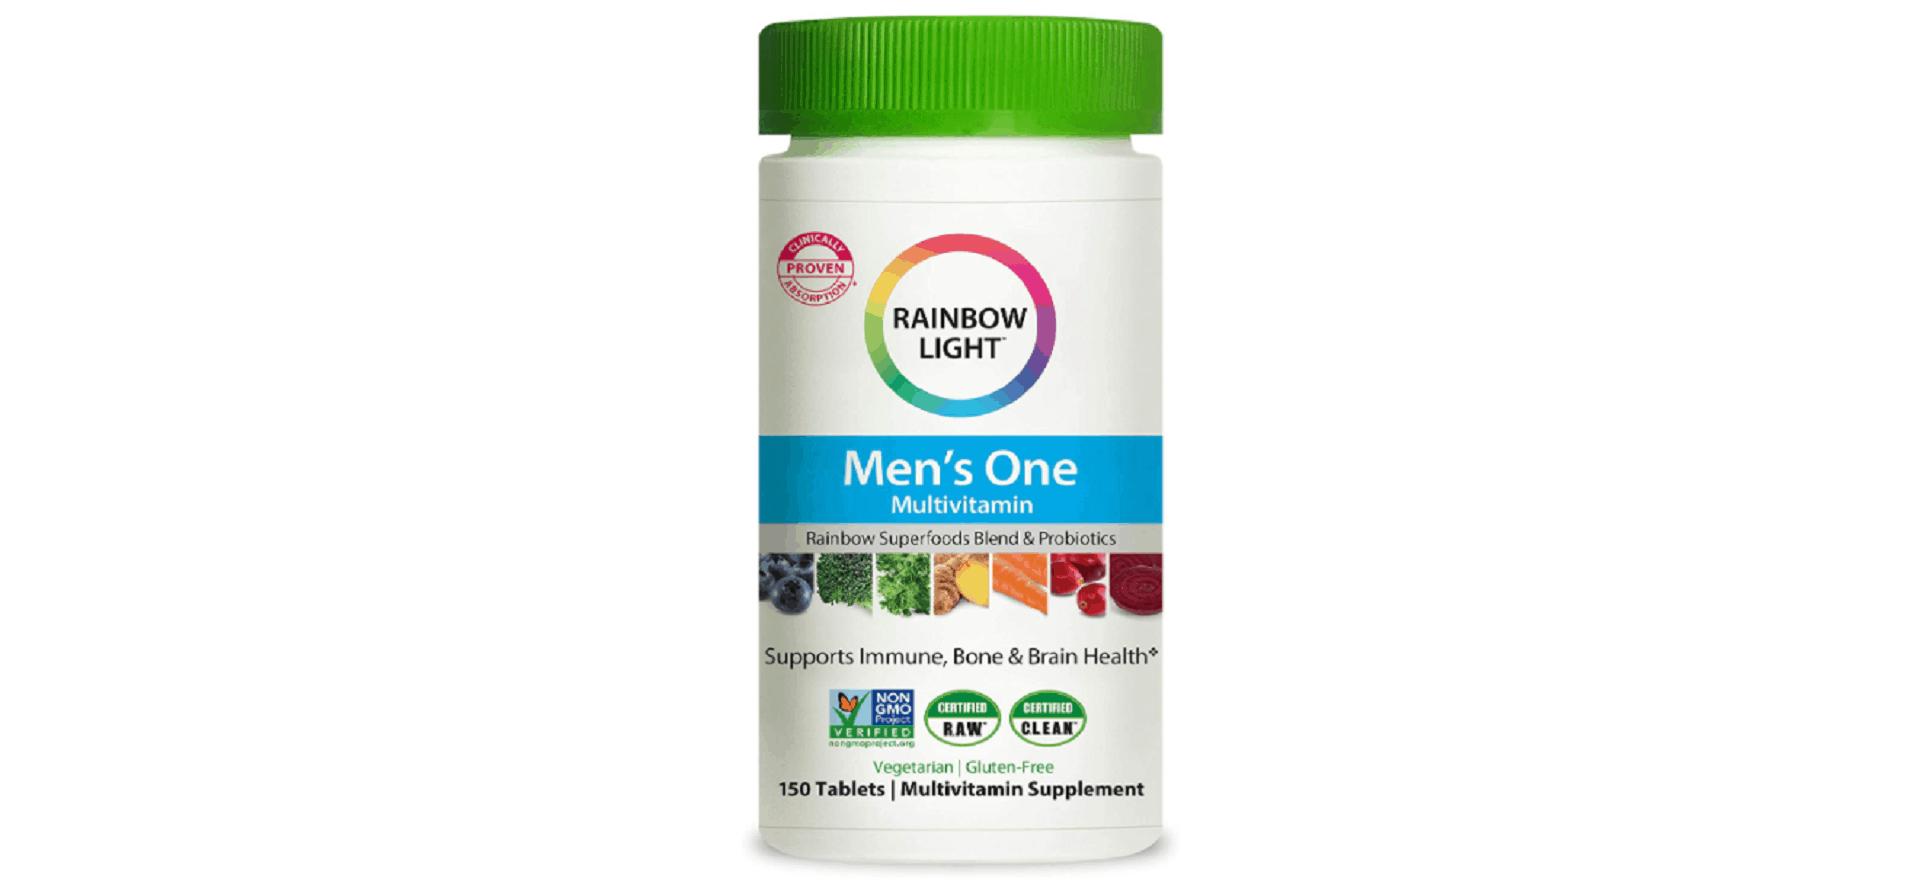 Rainbow Light Men's One Multivitamin